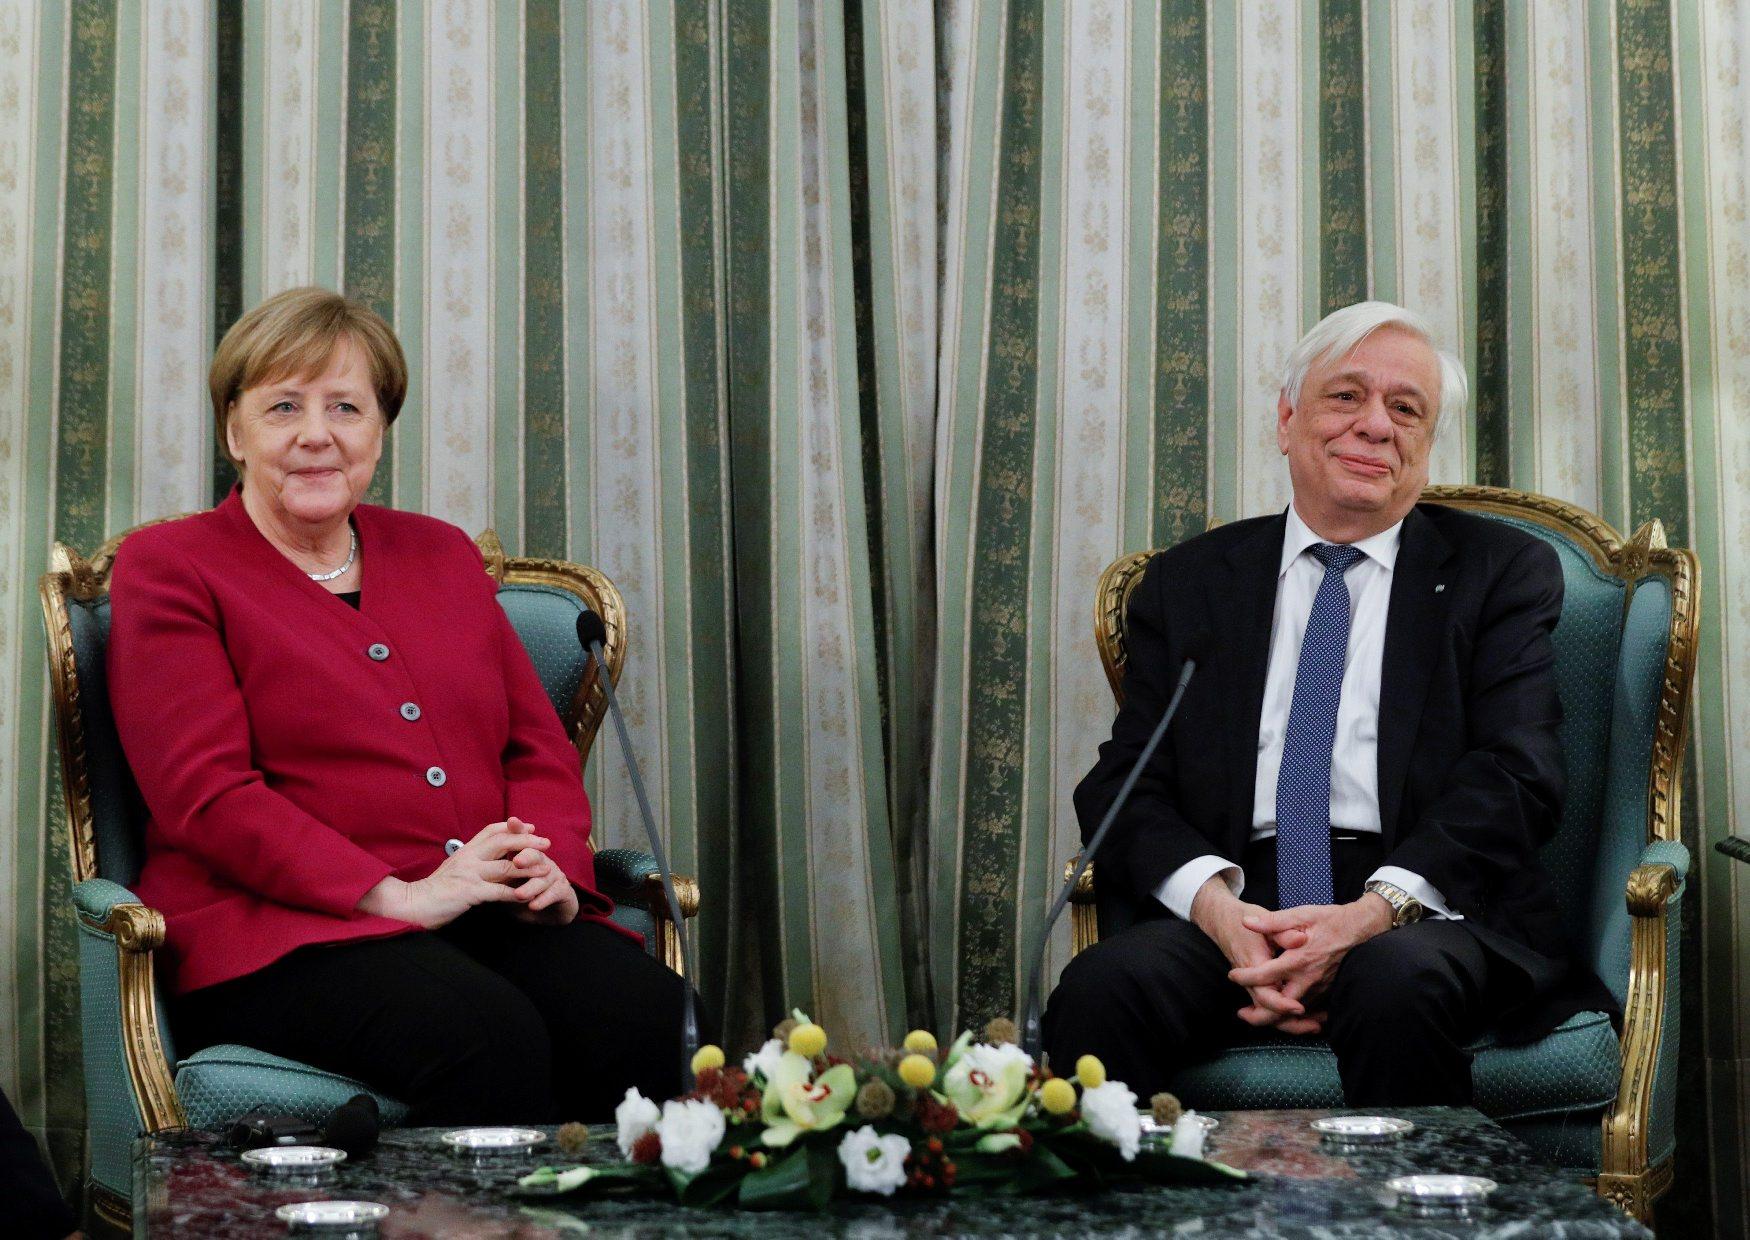 Njemačka kancelarka Angela Merkel i grčki predsjednik Prokopis Pavlopoulos